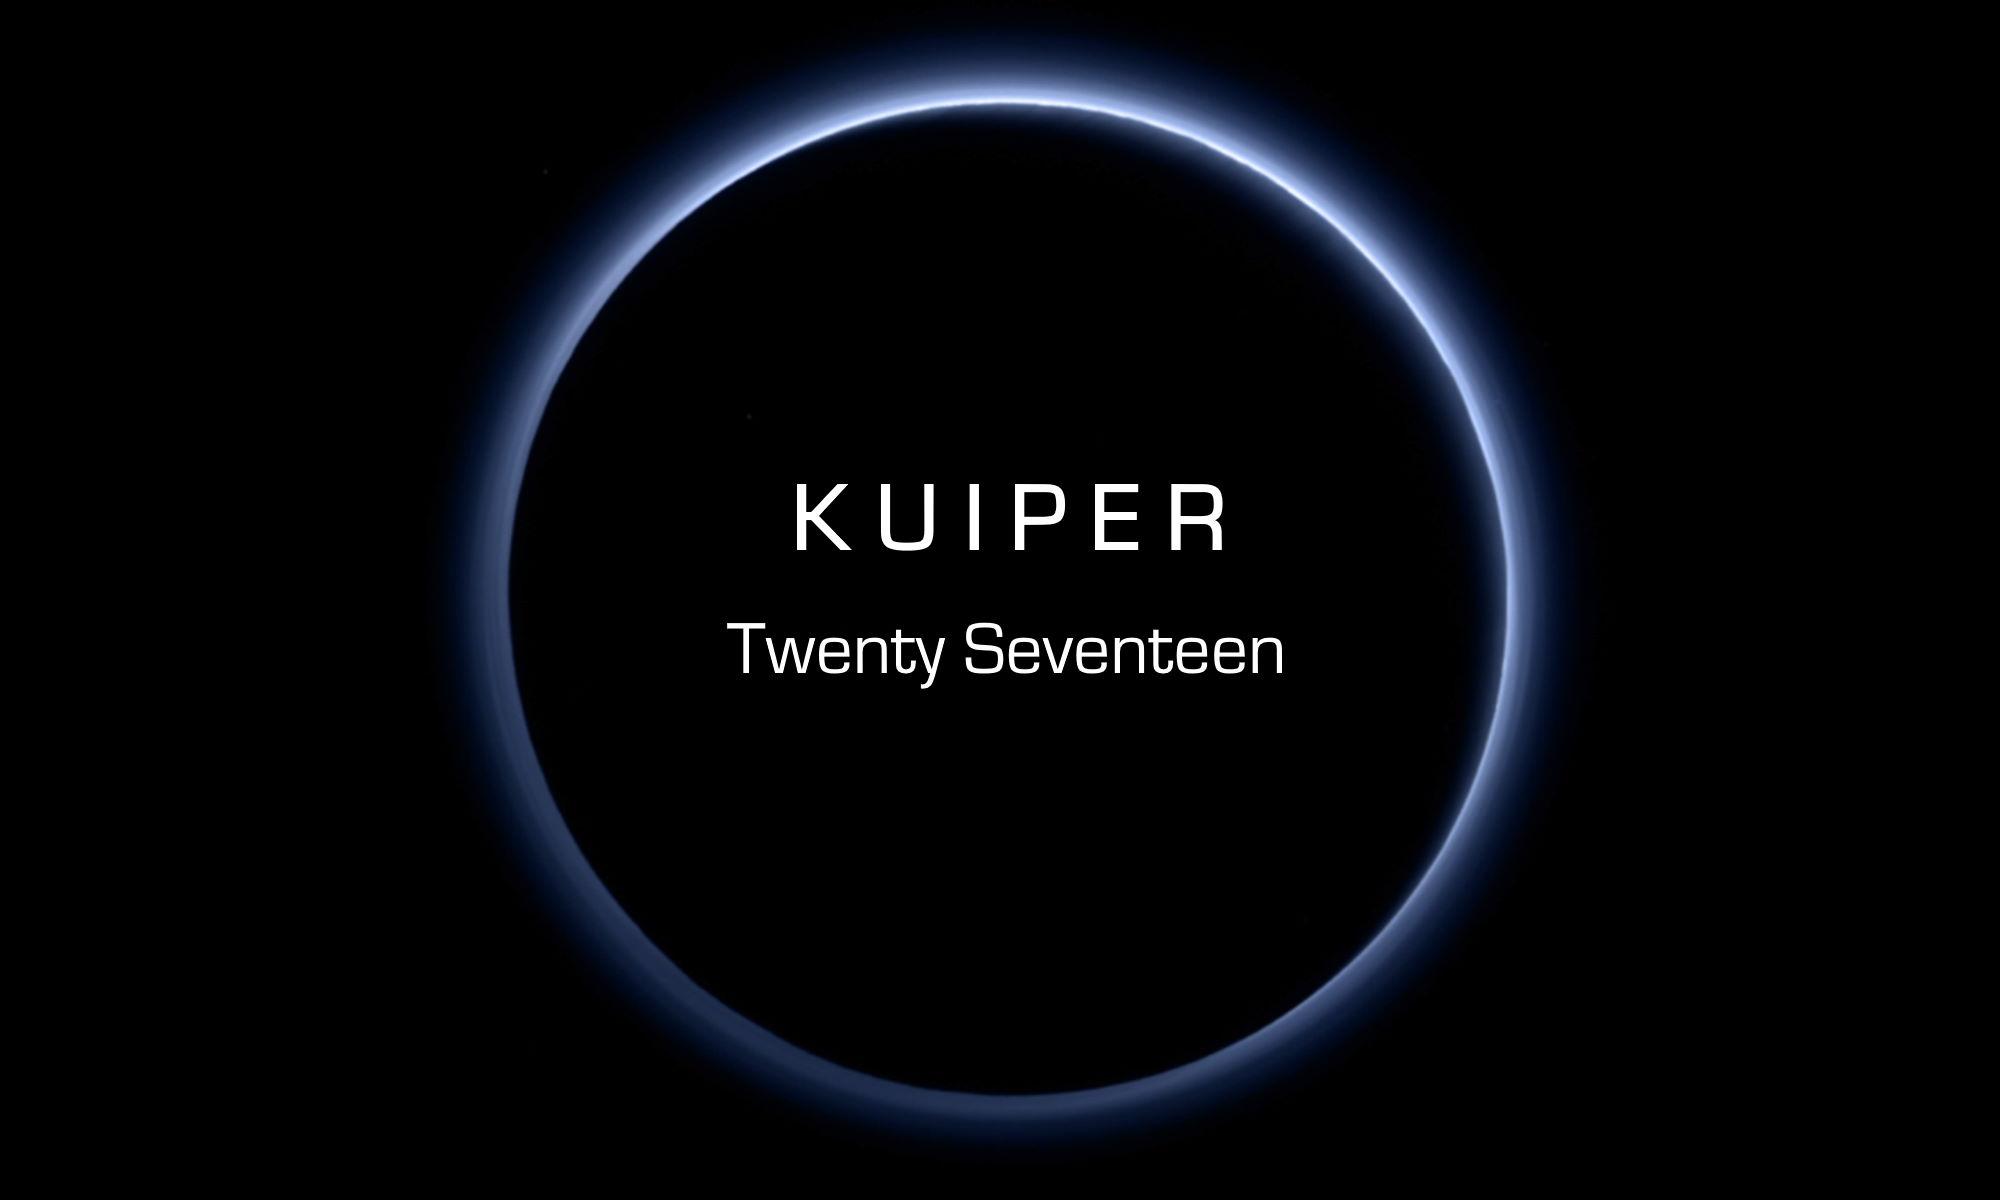 KUIPER Twenty Seventeen